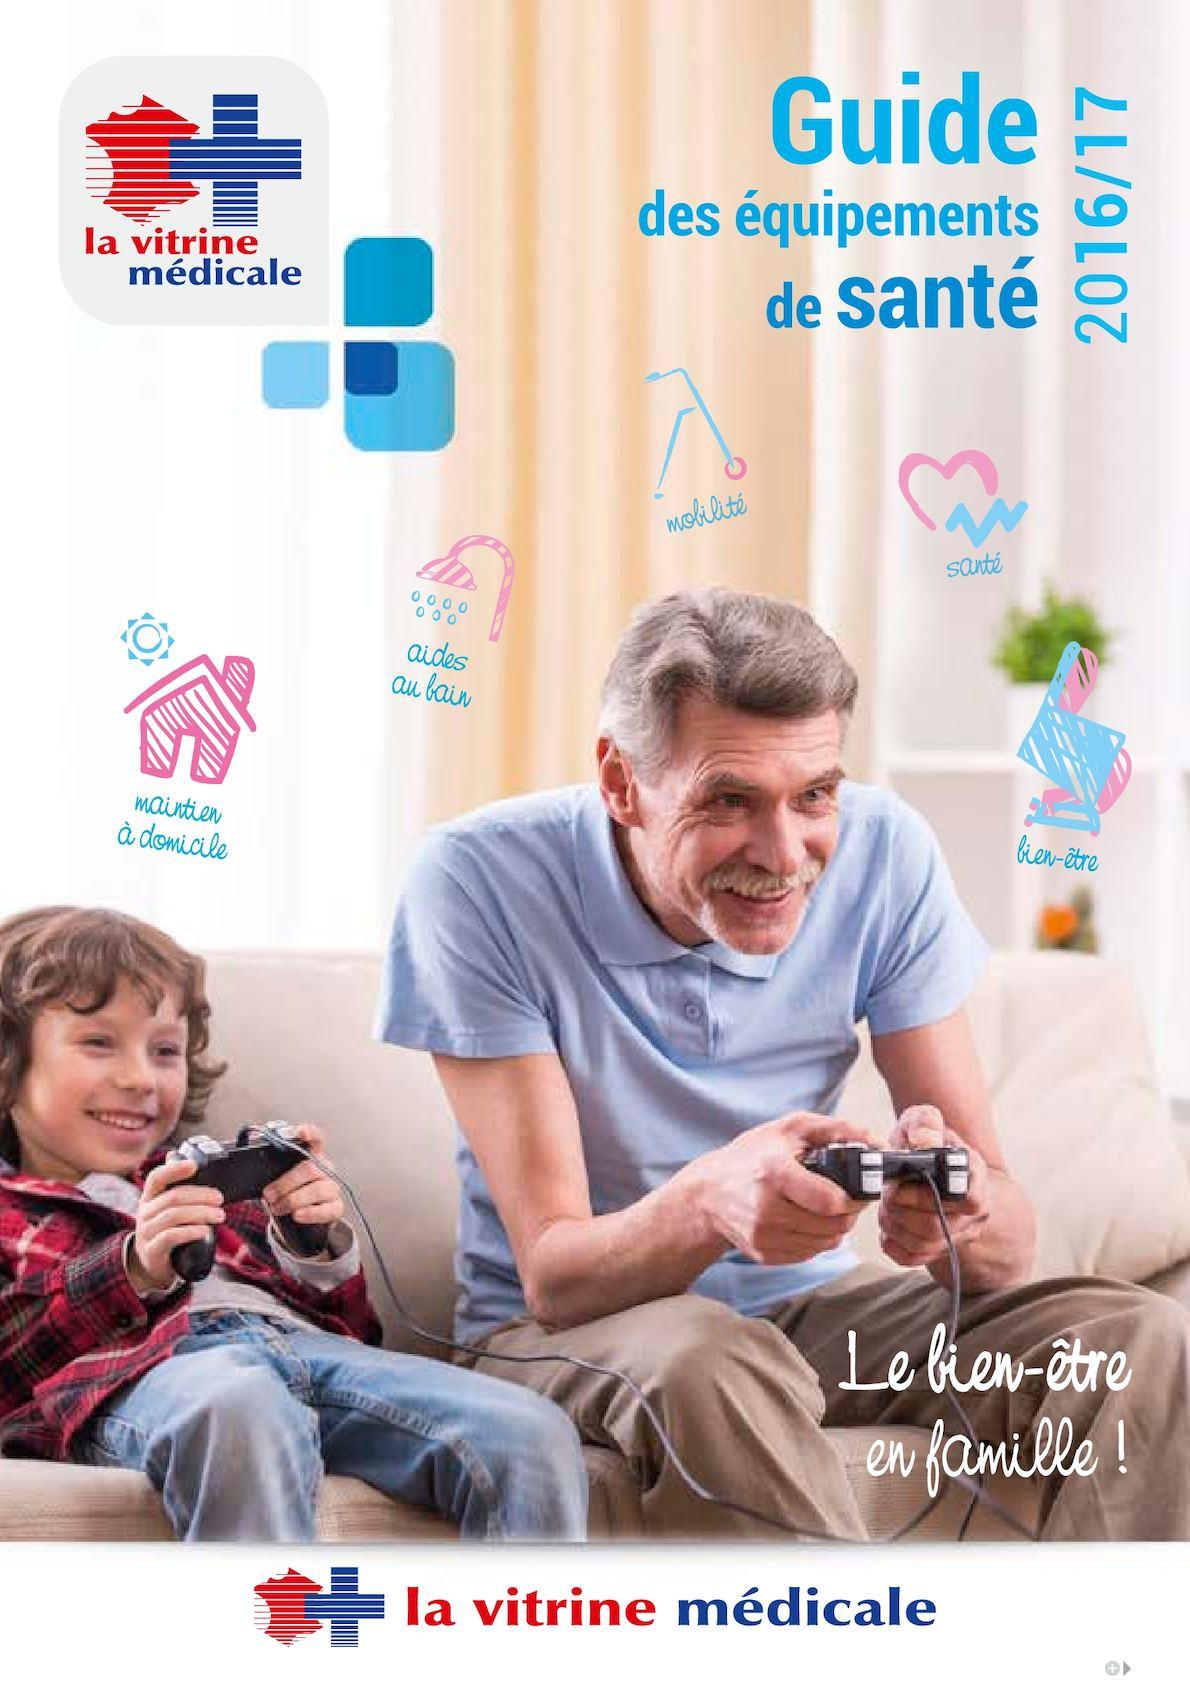 17 Guide Bd 2016 Equipement Sante De Lvm Calaméo eCroWdxB